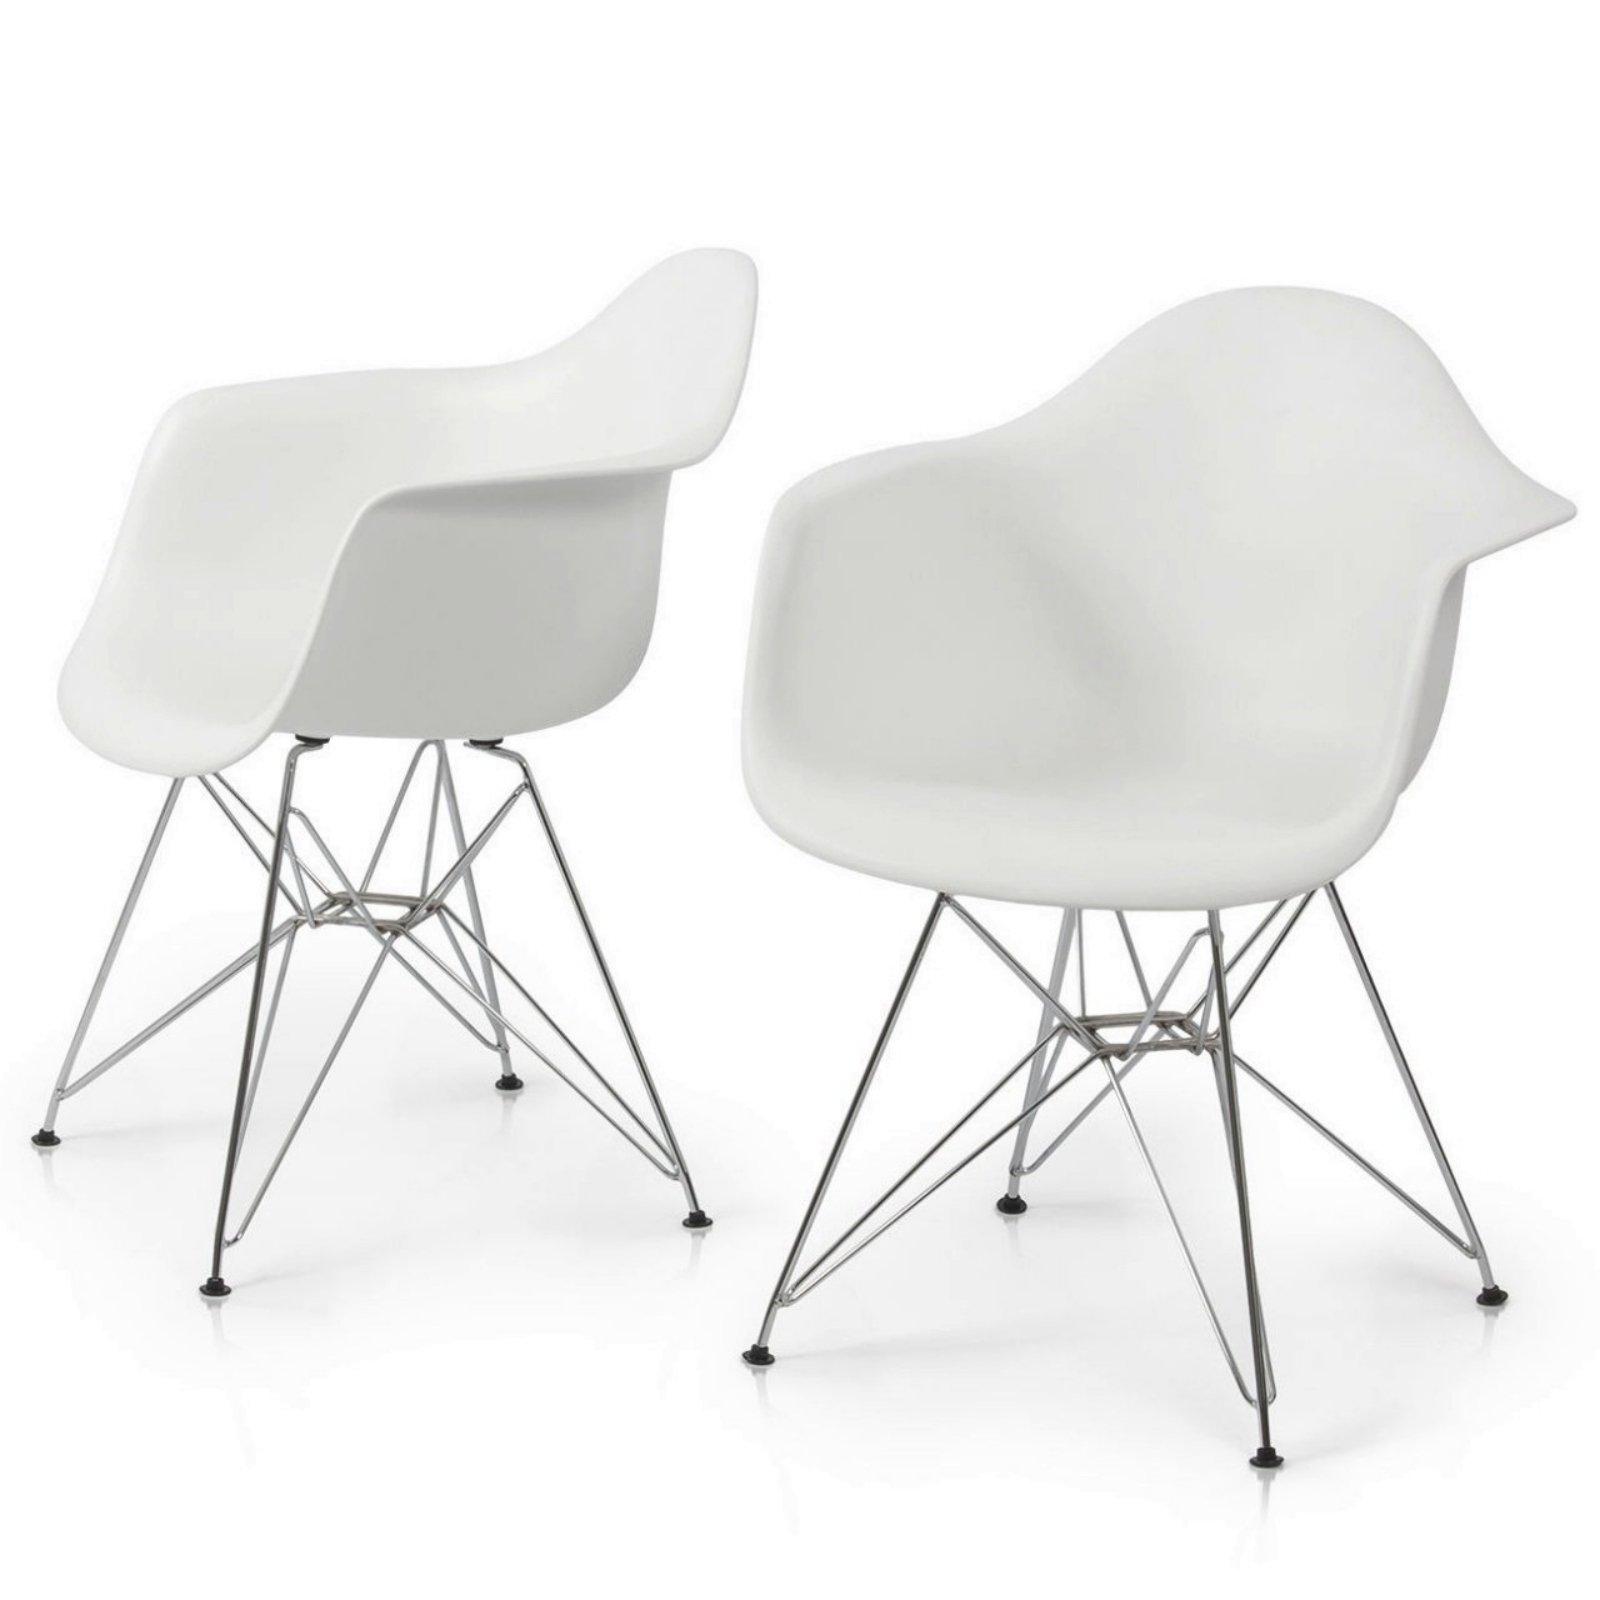 Modern Dining Chair Chromed Steel Frame Durable ABS Plastic Posture Support Backrest Design Innovative Side Chair - Set of 2 White #1425